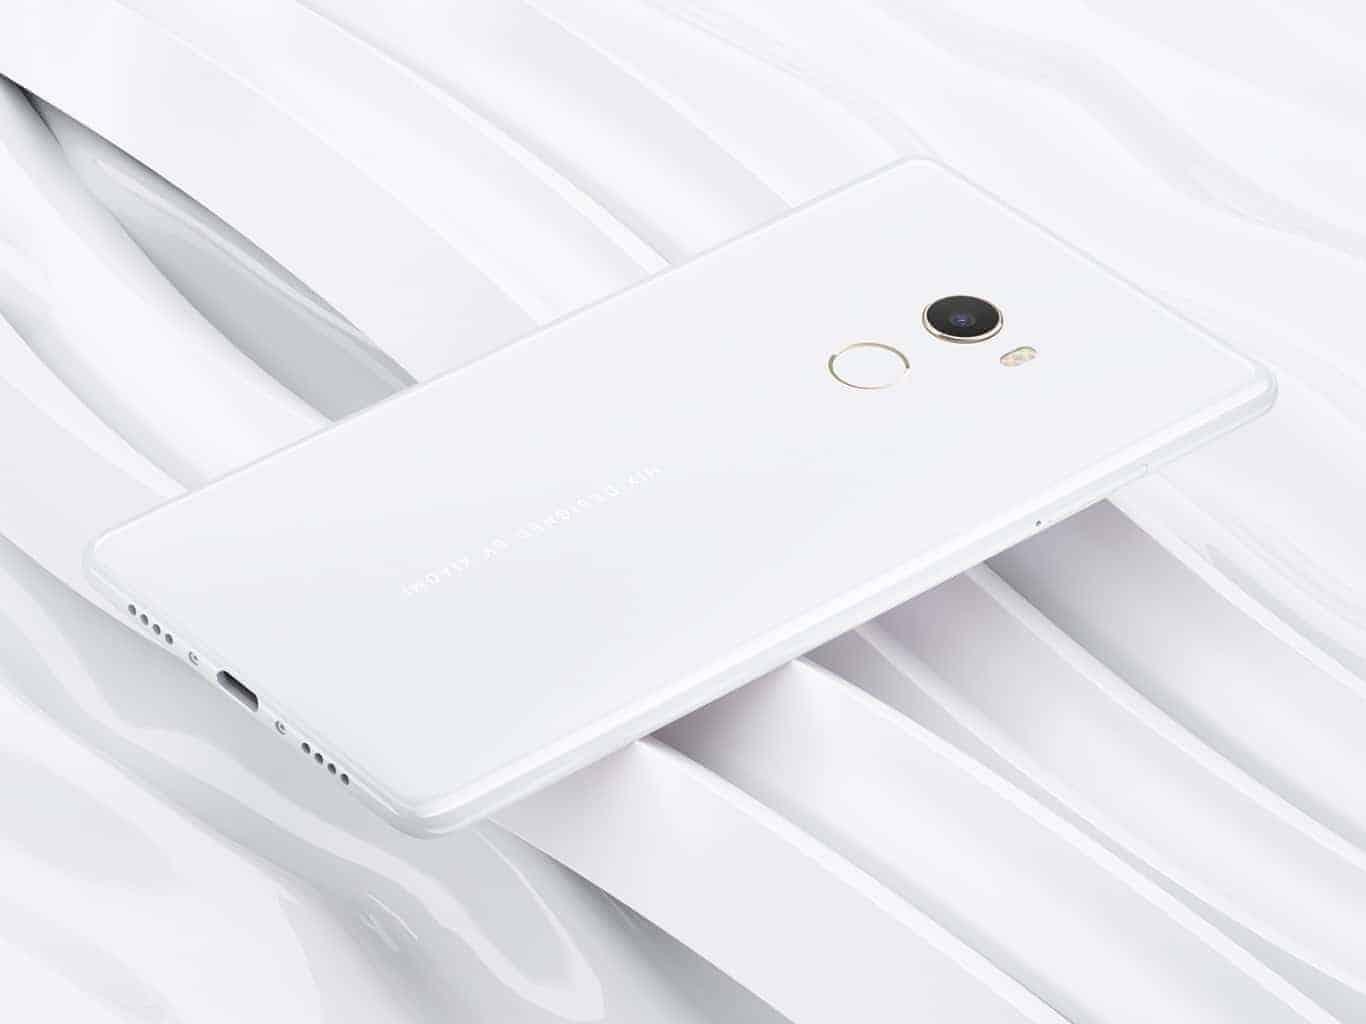 Xiaomi Mi MIX 2 Special Edition 8